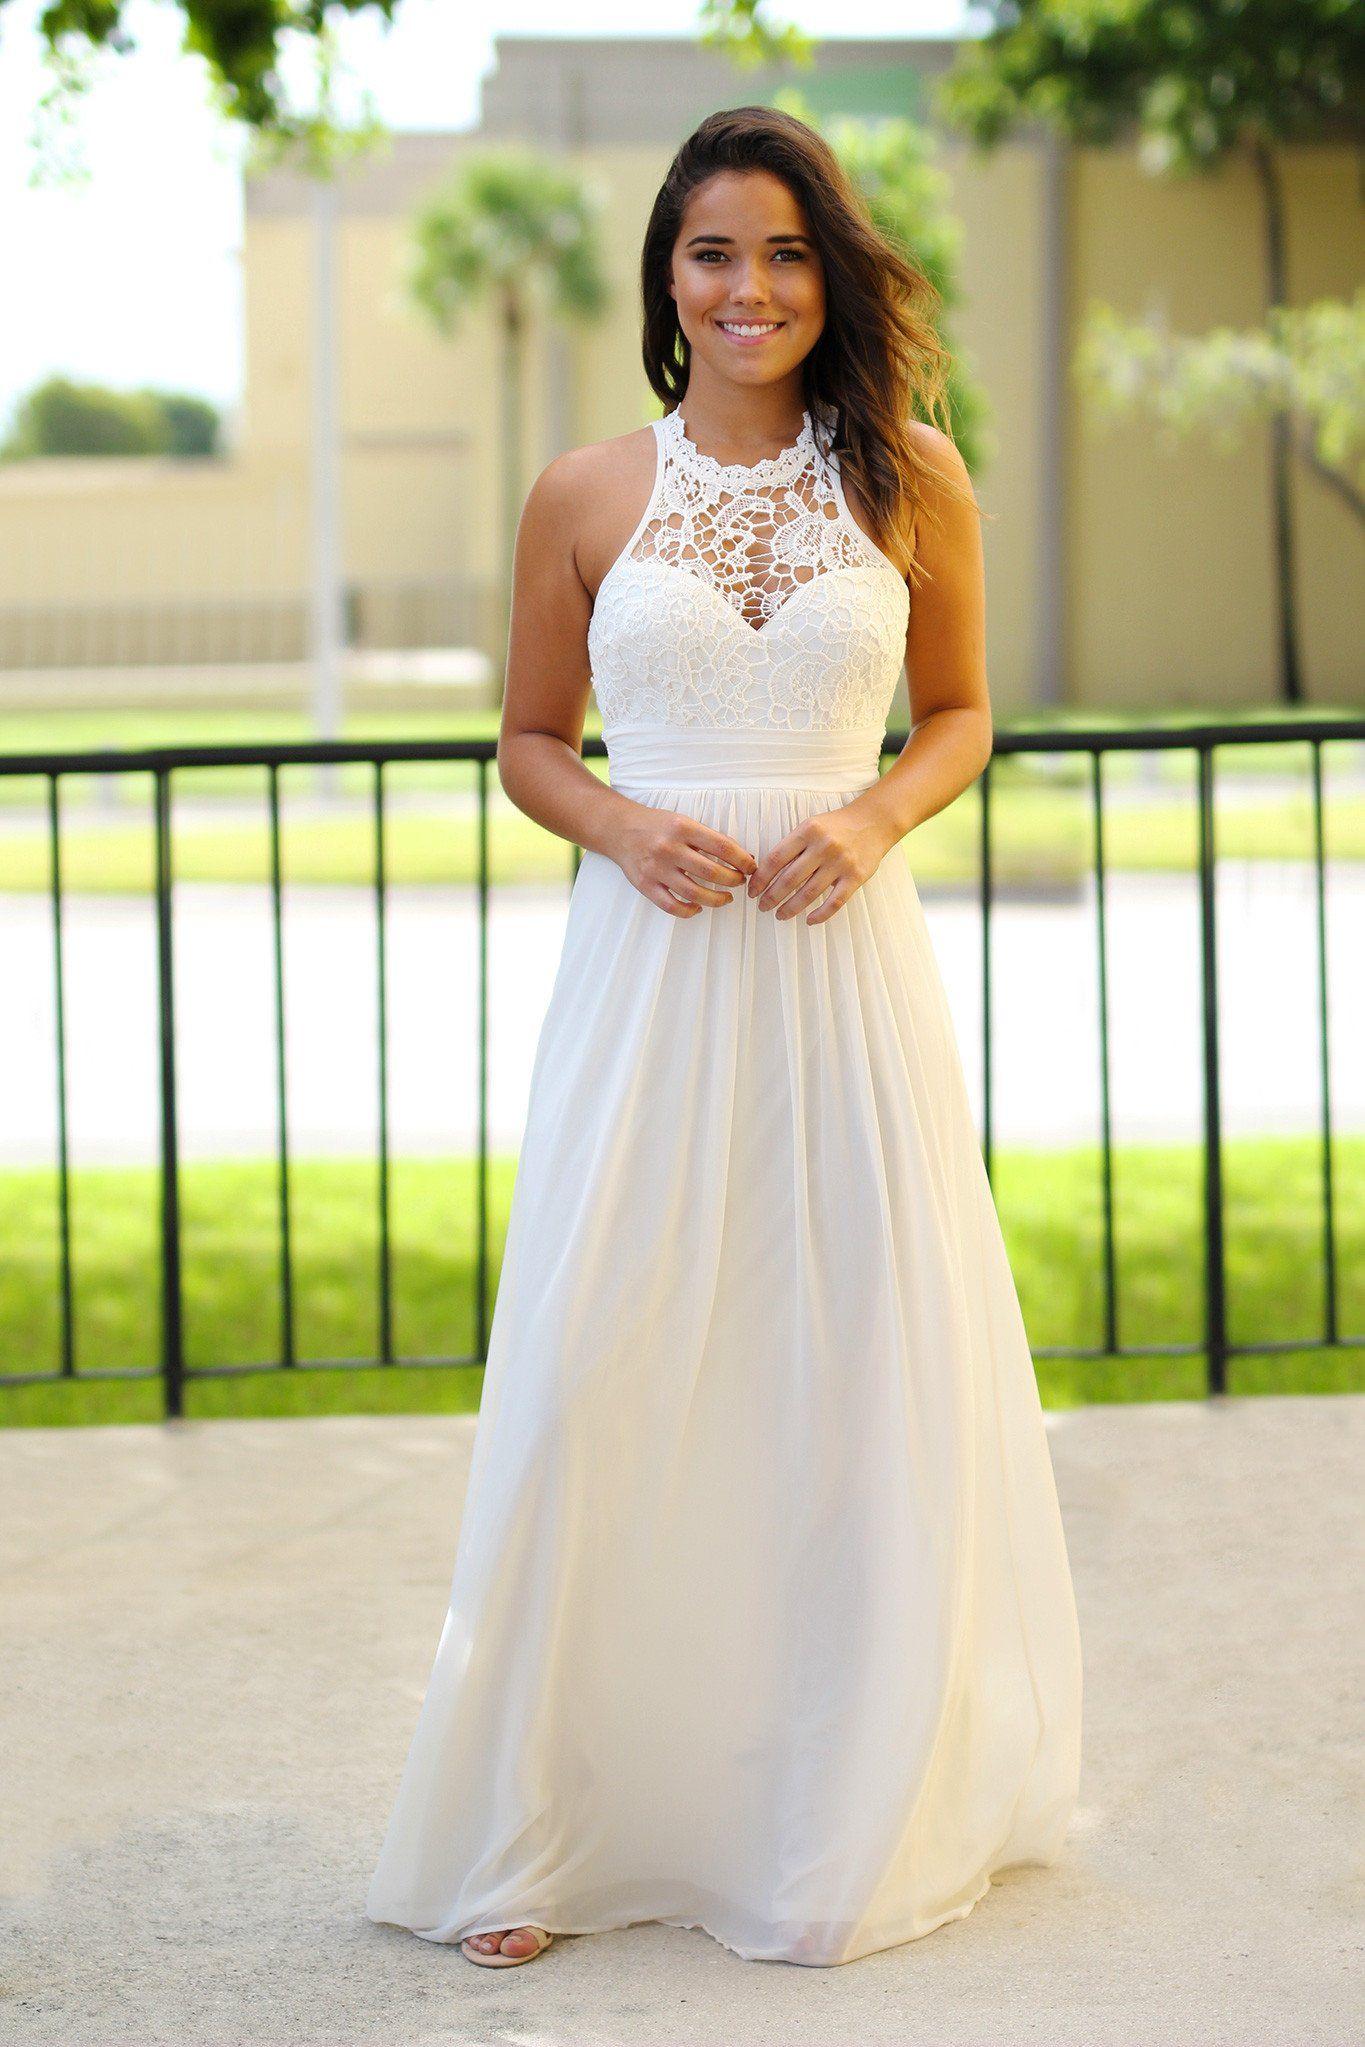 Beige Crochet Maxi Dress | neat future wedding ideas | Pinterest ...